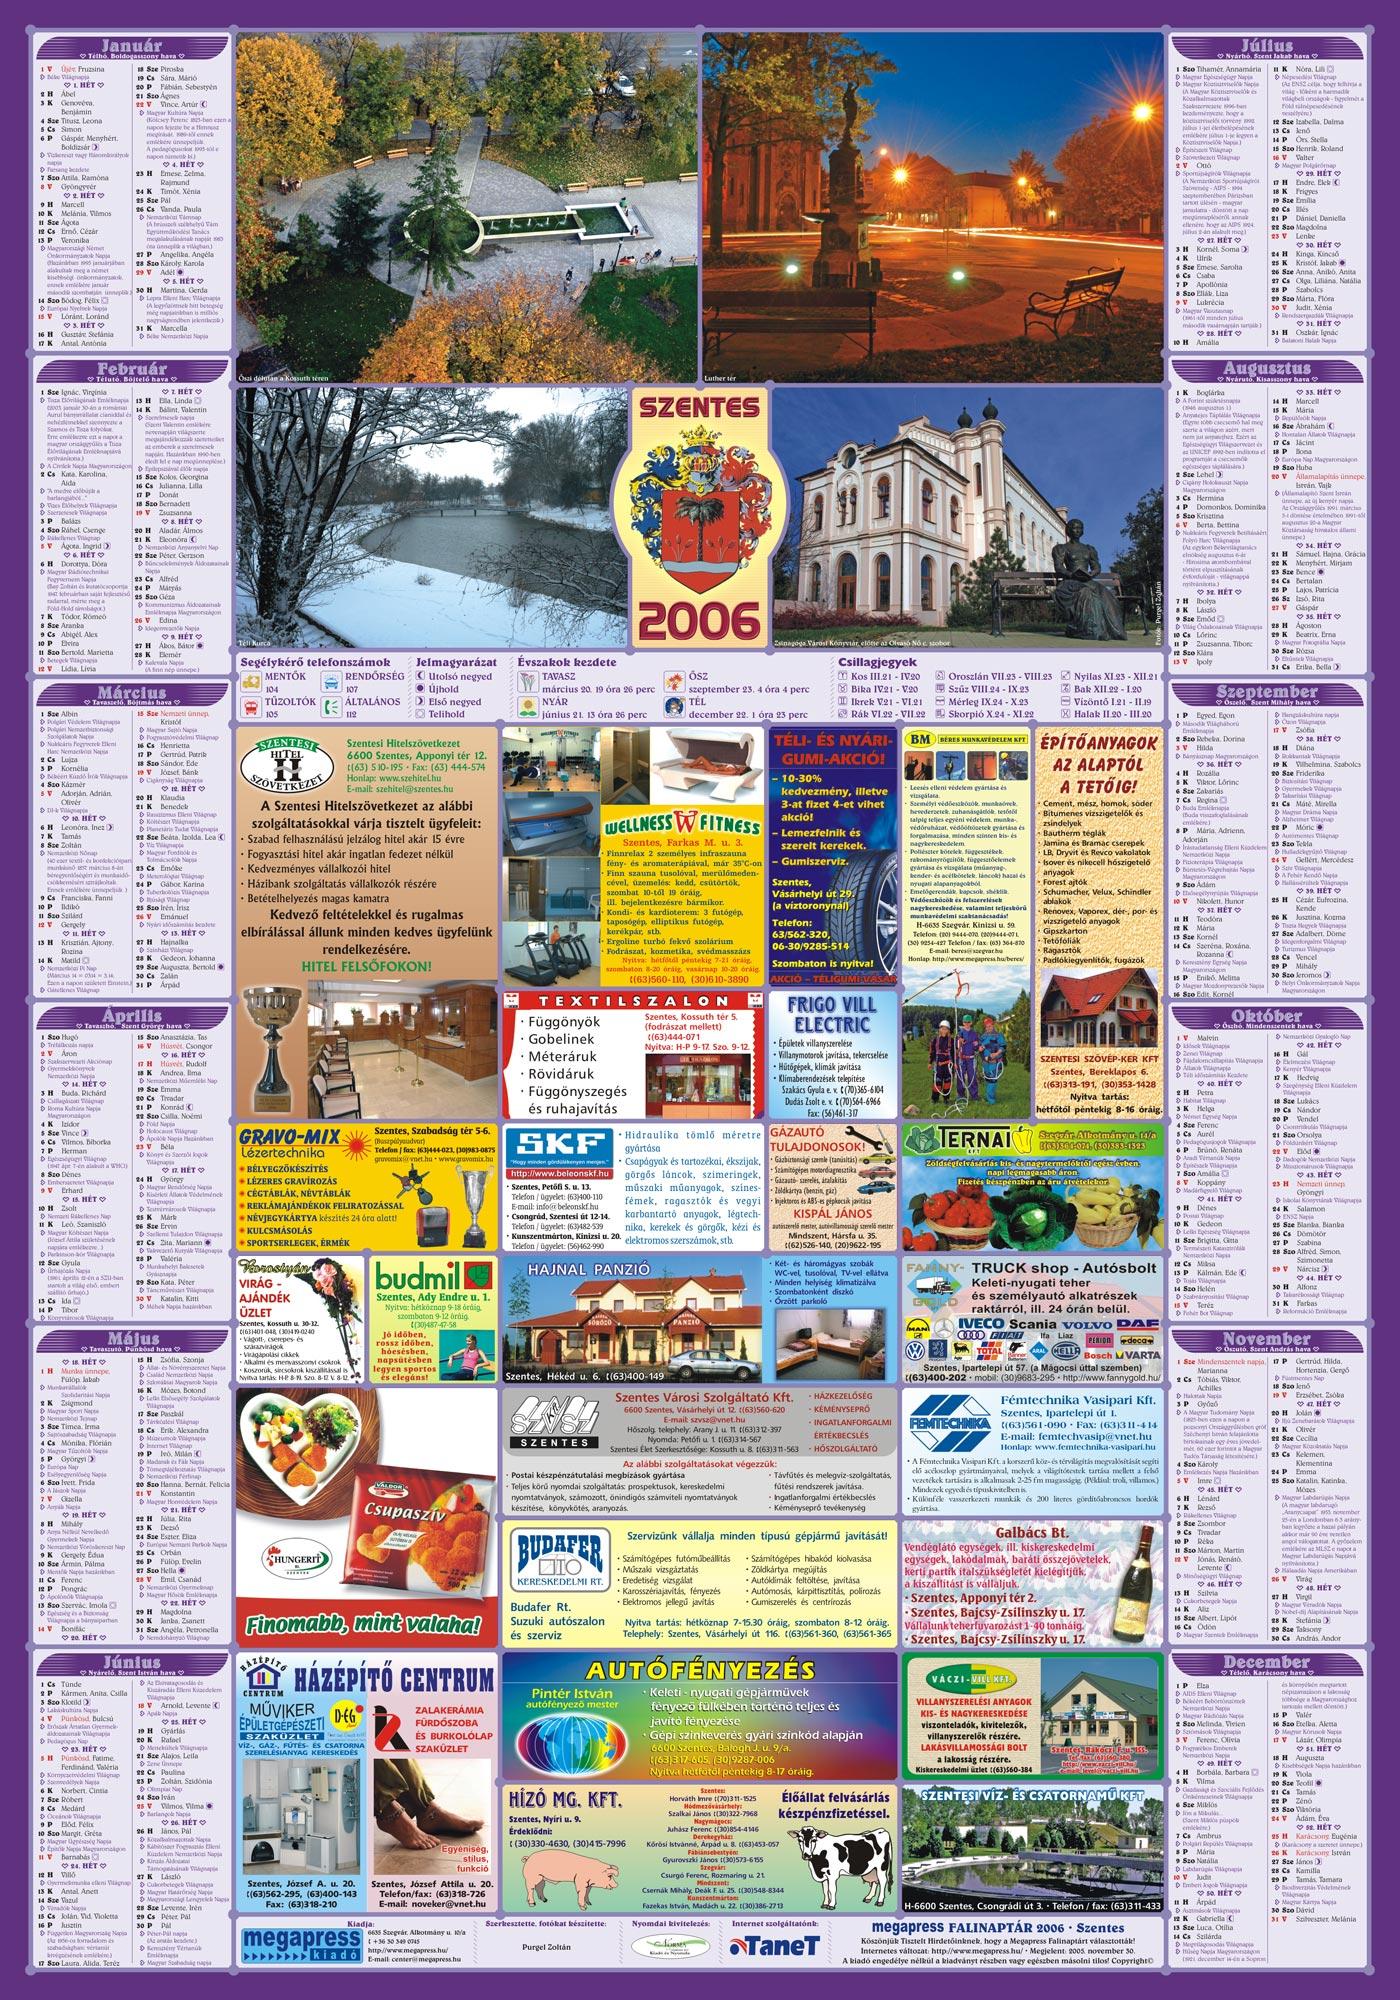 29-Szentes2006Falinaptar-2005